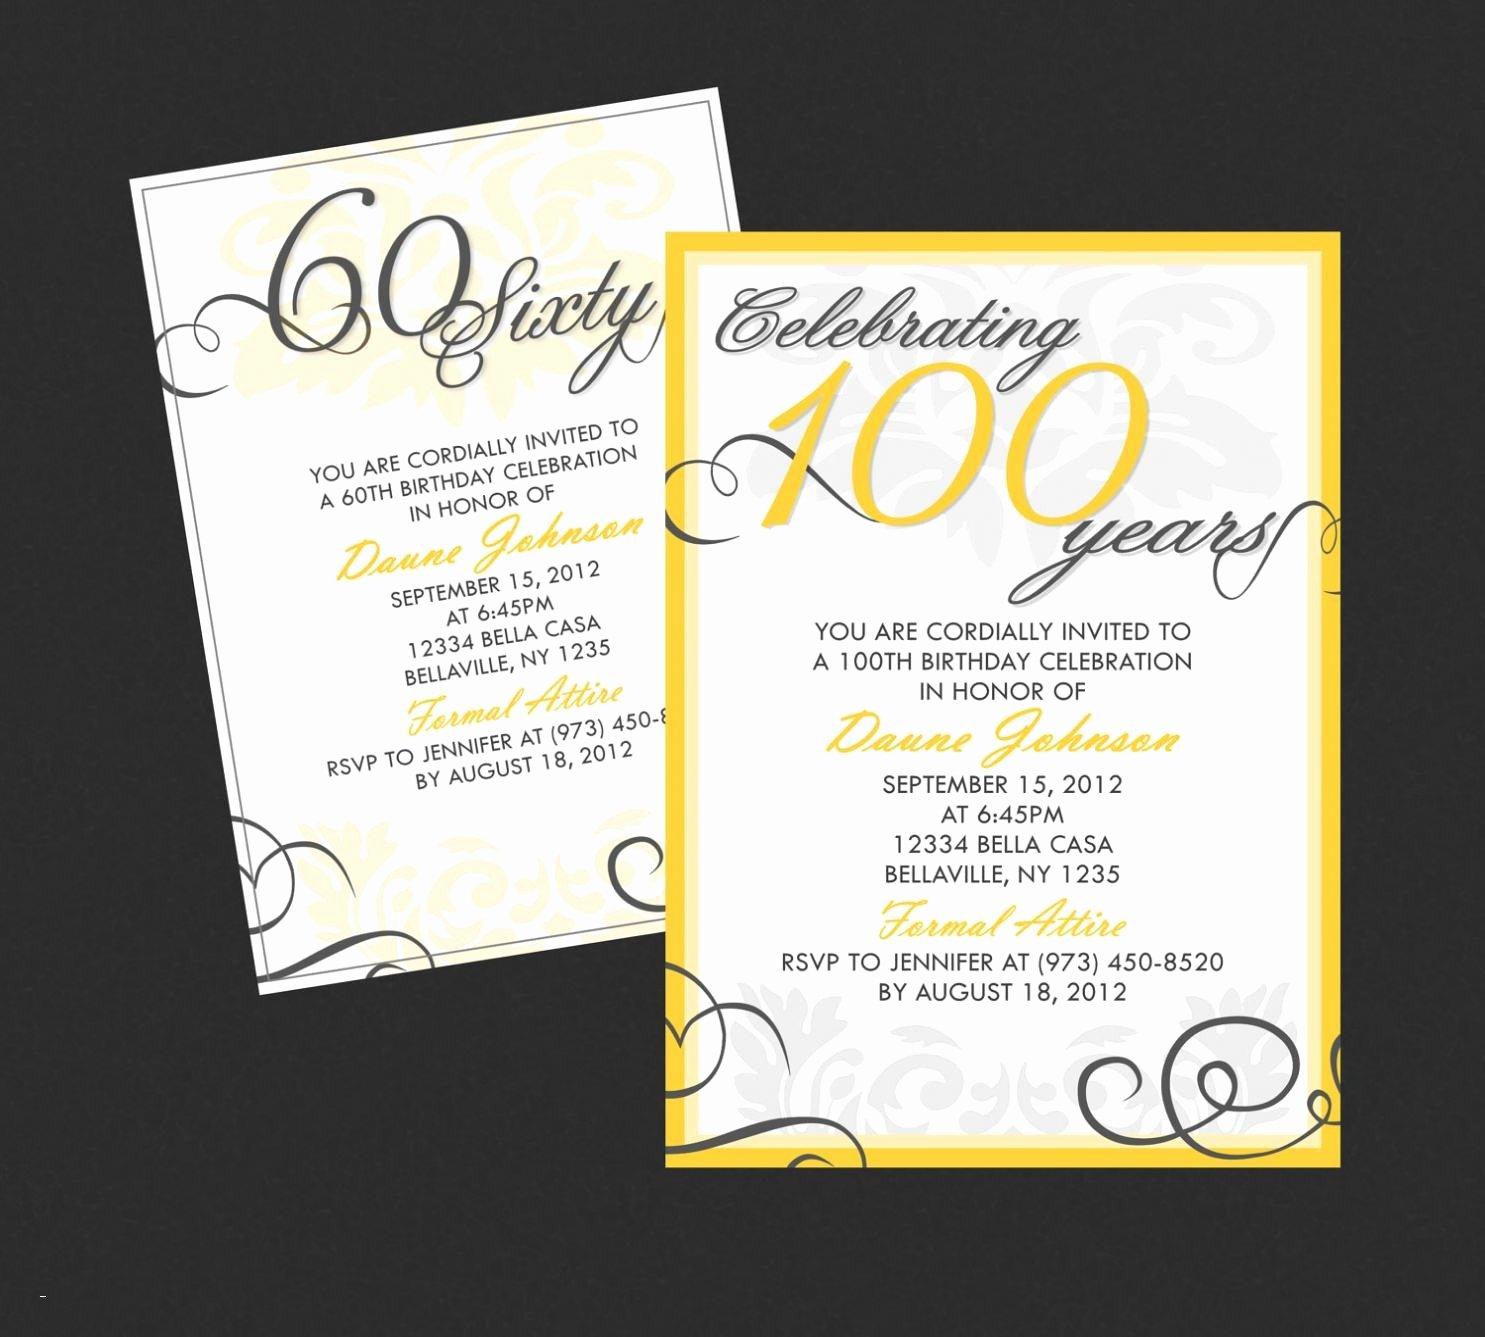 60th Birthday Invitation Template Luxury Surprise 60th Birthday Invitation Templates Free Fresh